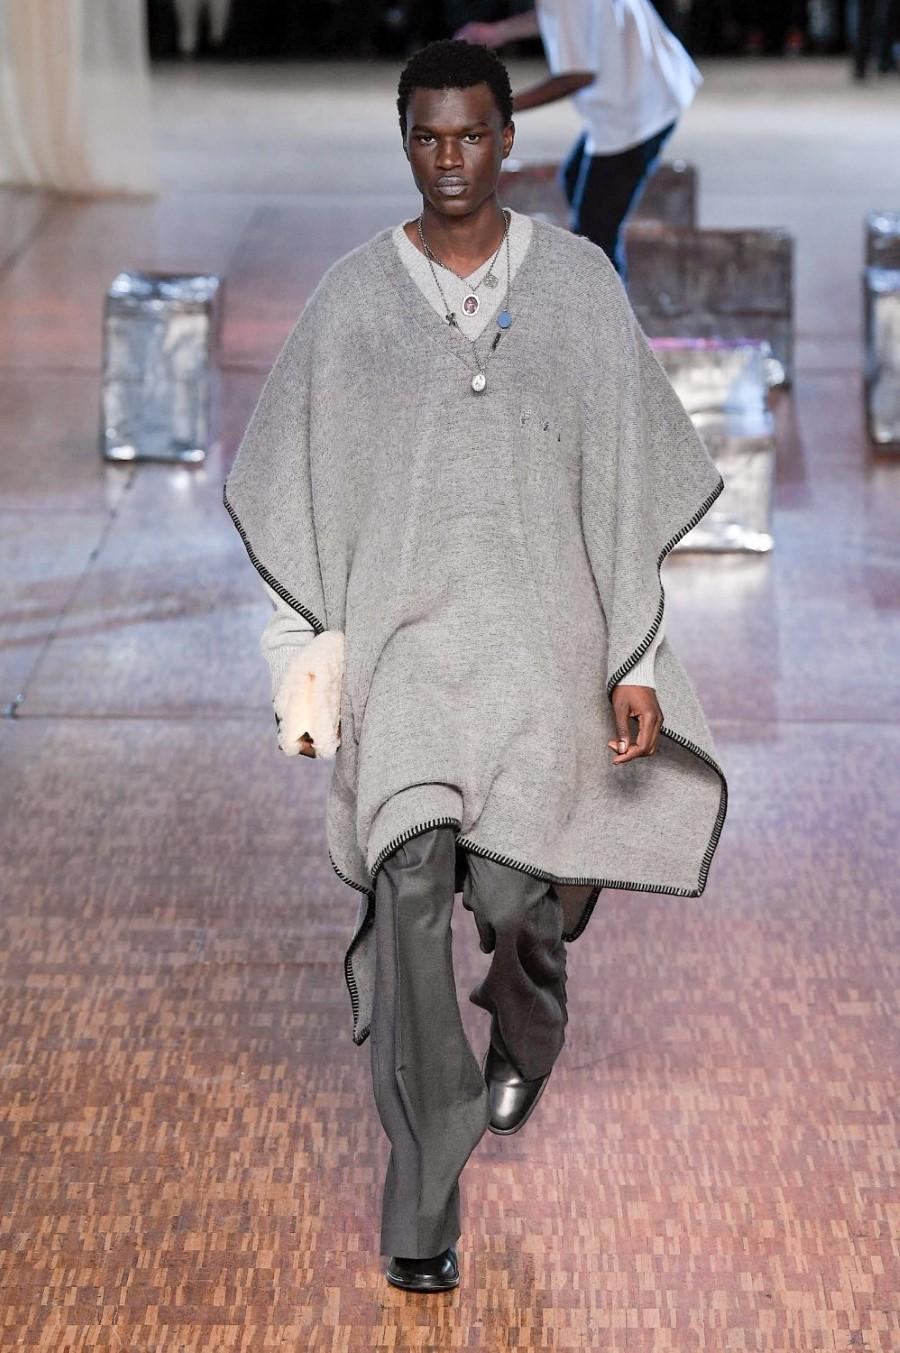 Off-White - Fall Winter 2020 - Paris Fashion Week Men'sOff-White - Fall Winter 2020 - Paris Fashion Week Men's